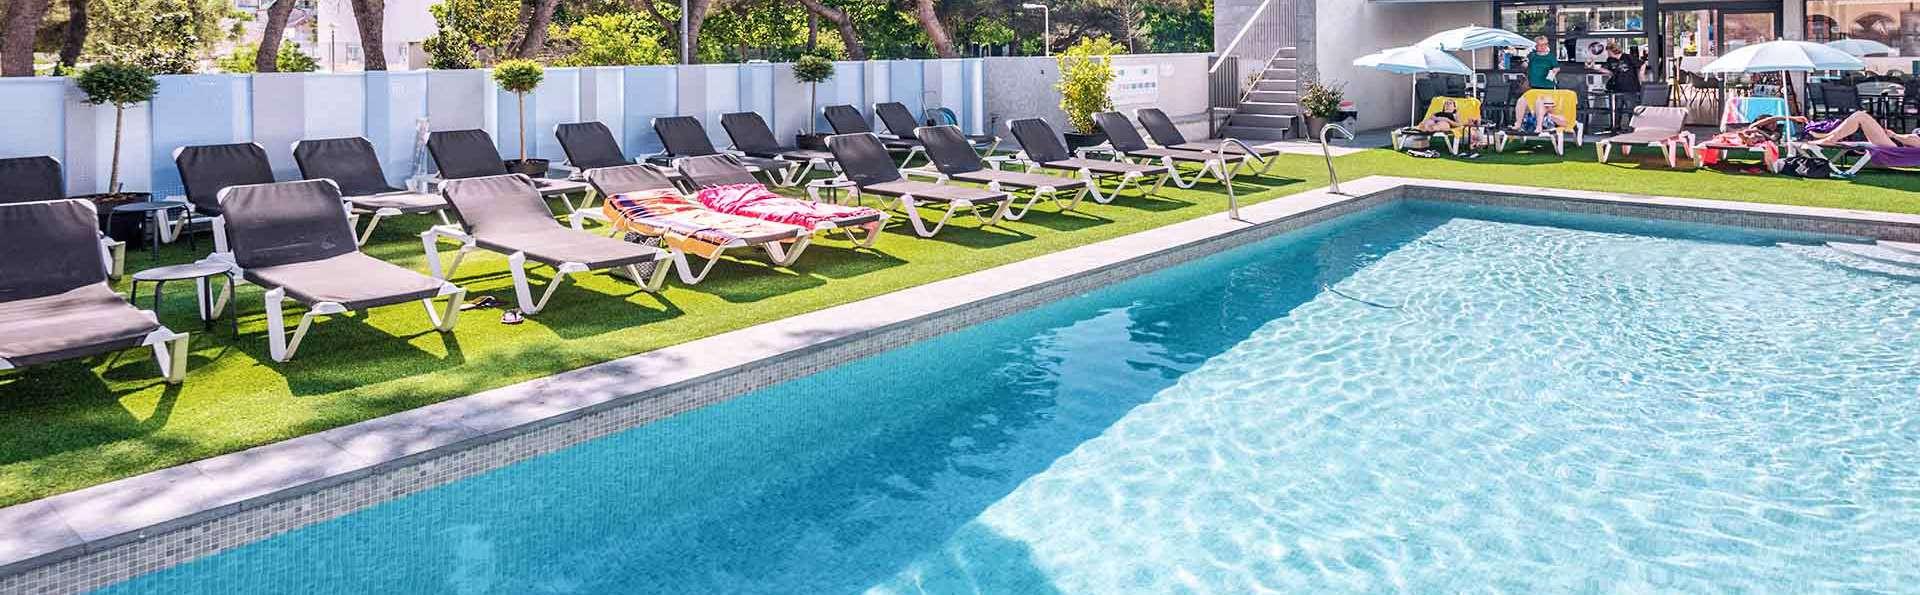 Hotel GHT Sa Riera - EDIT_ght-piscina-hotel-sa-riera-tossa_02.jpg